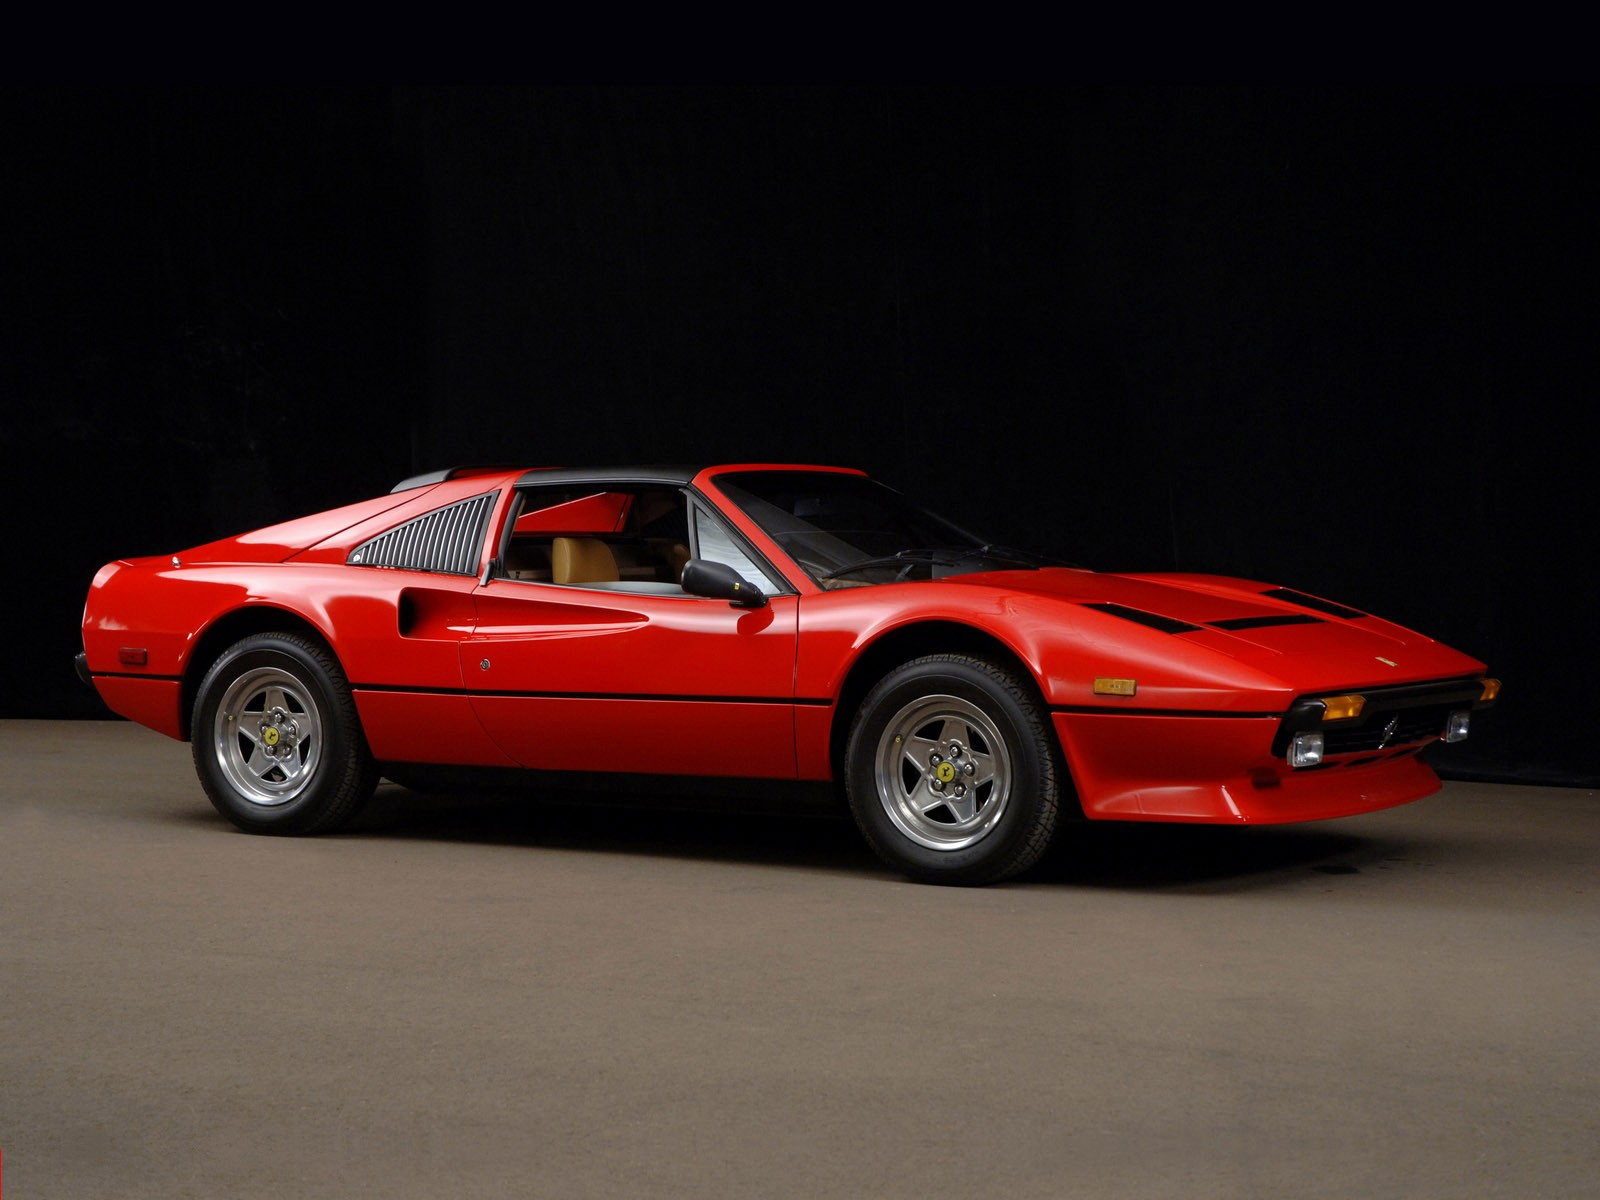 Ferrari 308 GTS Quattrovalvole 1982